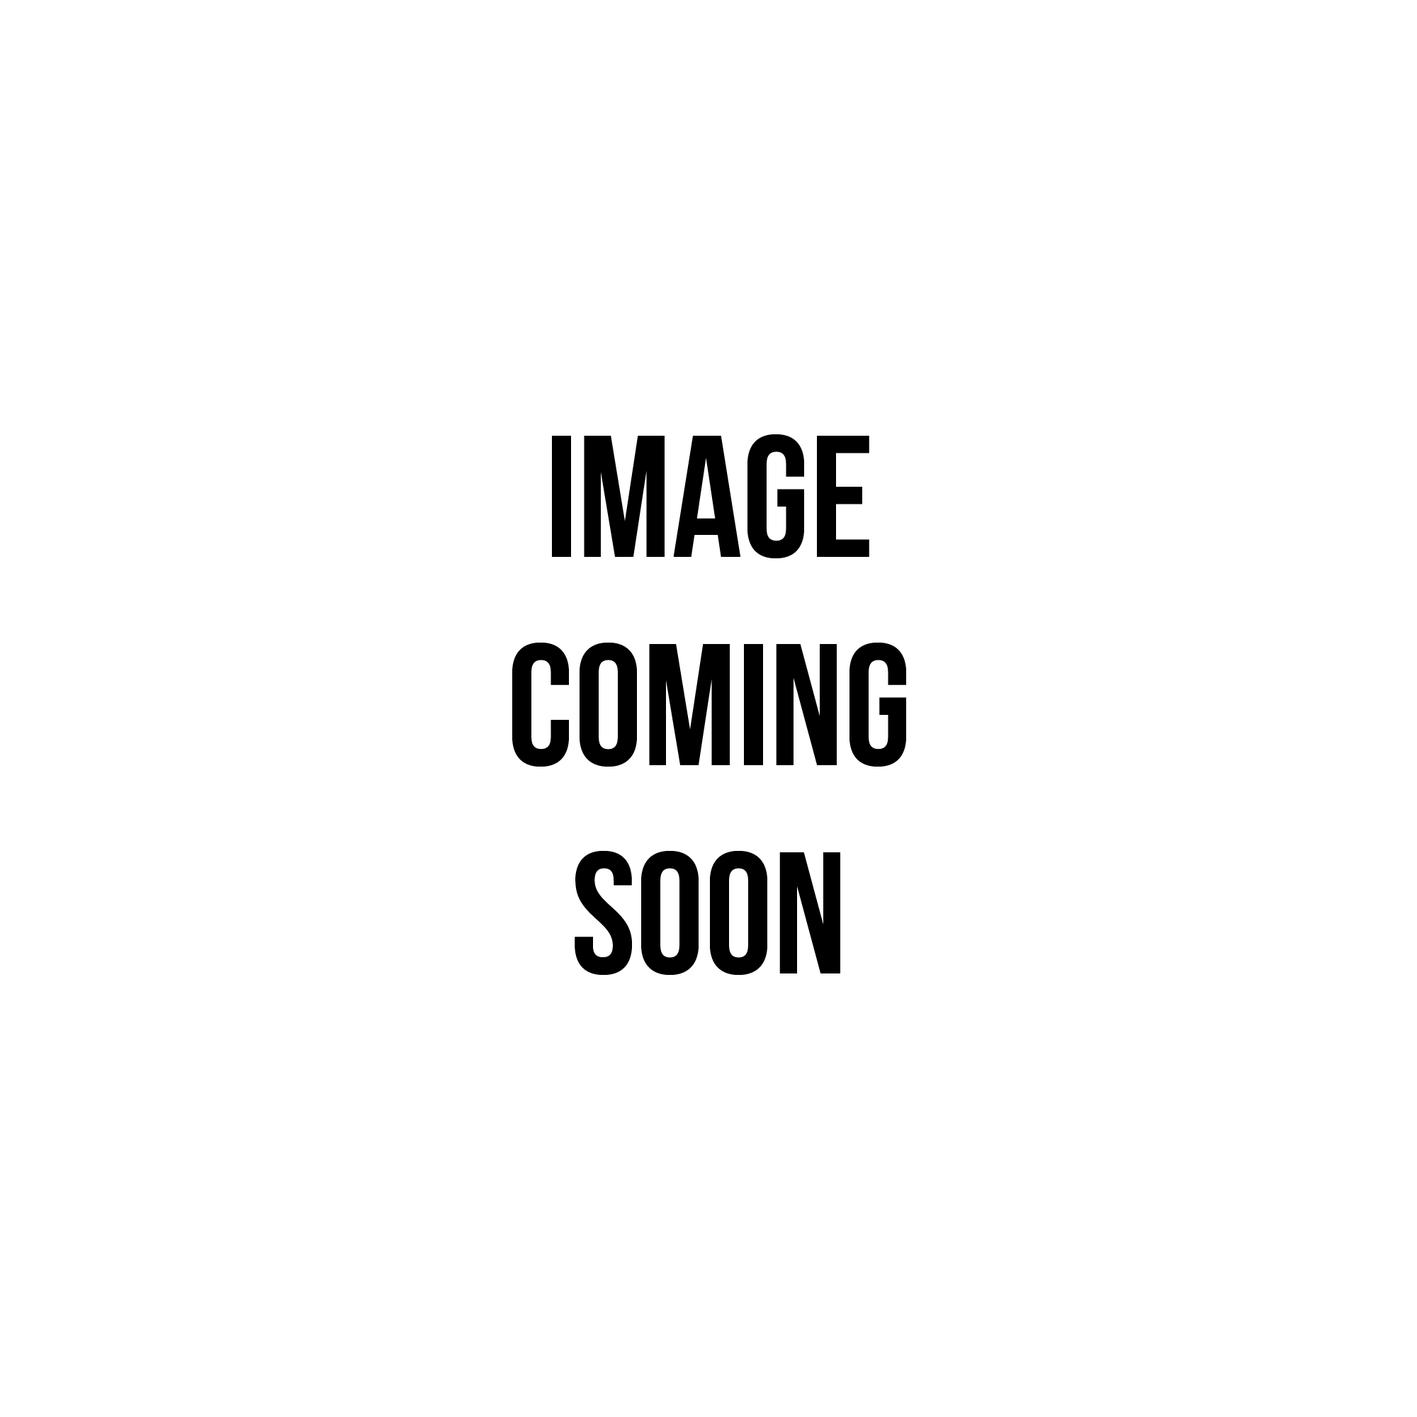 d7ba2e21556c Nike Team Fly Shorts - Men s - For All Sports - Clothing - Scarlet White